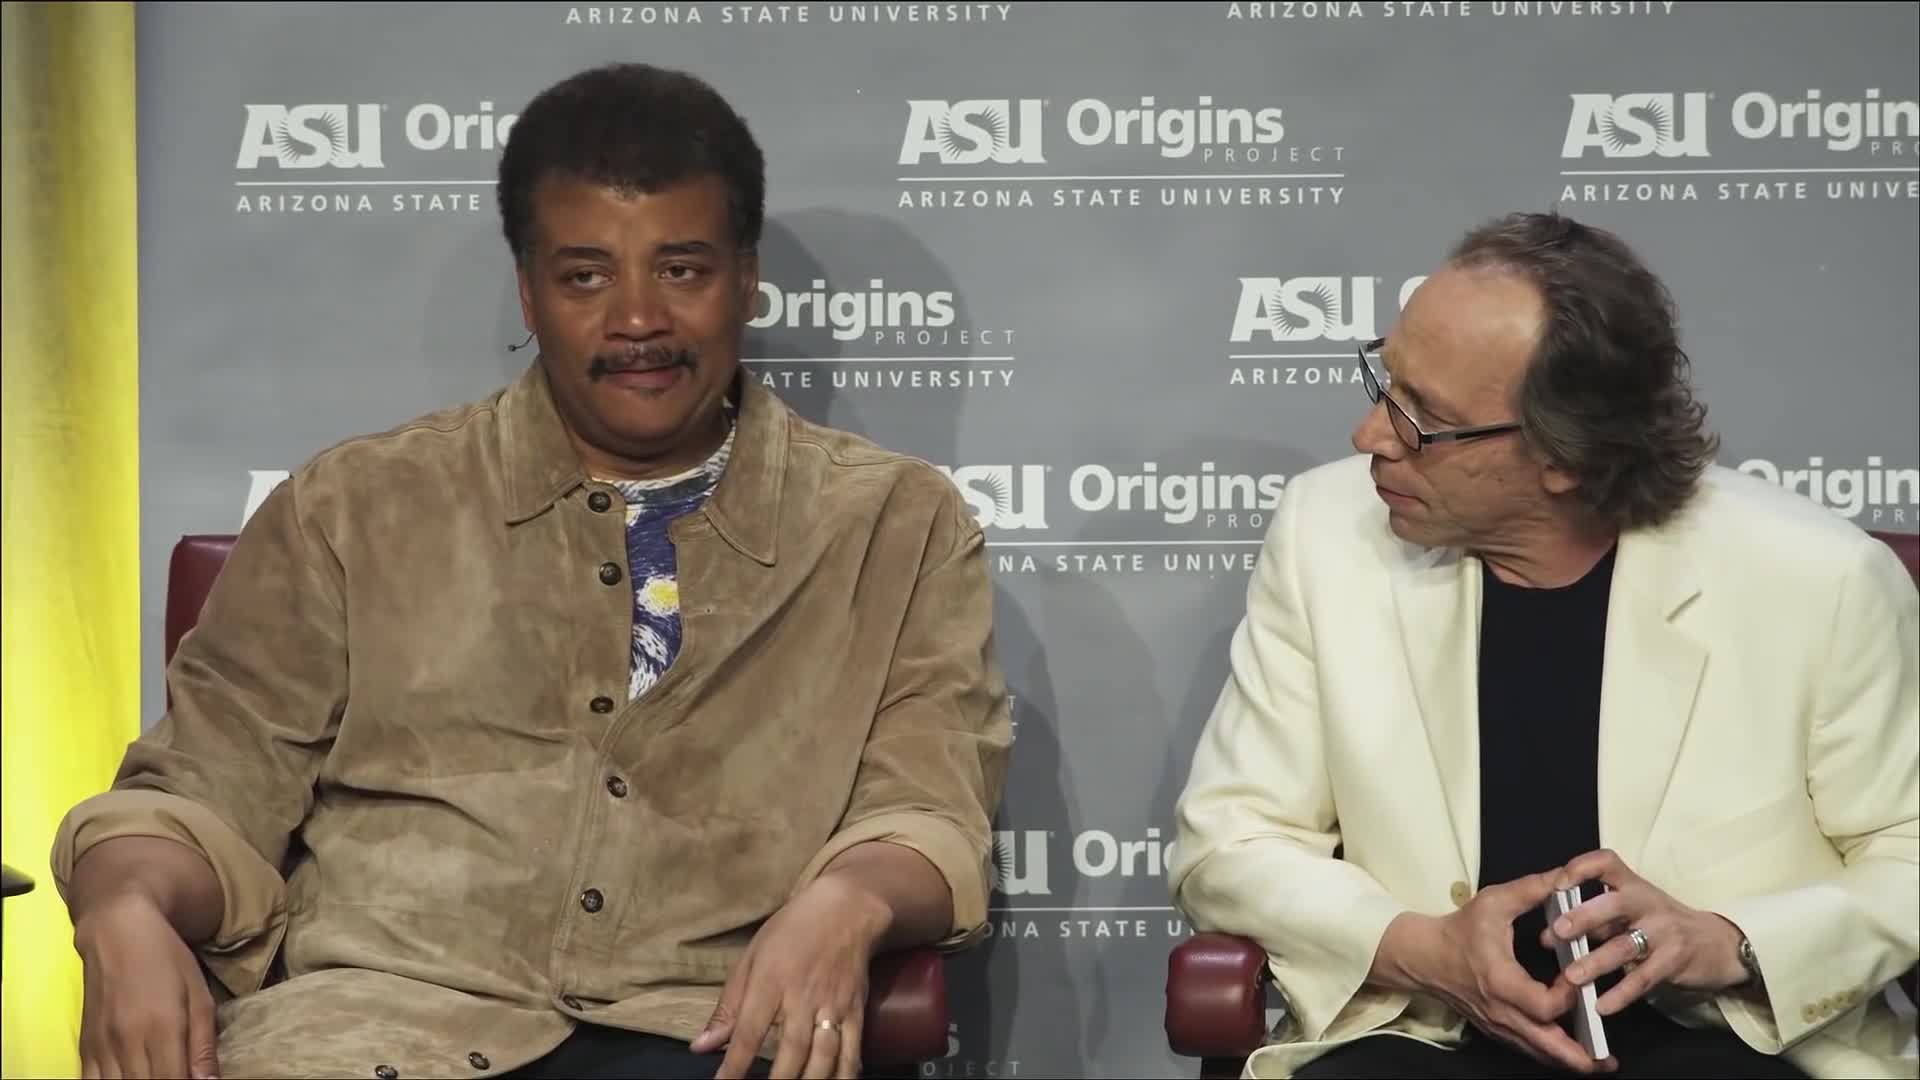 ASU, Lawrence Krauss, Neil deGrasse Tyson, Origins, Project, Science, Storytelling, Neil deGrasse Tyson neck roll GIFs